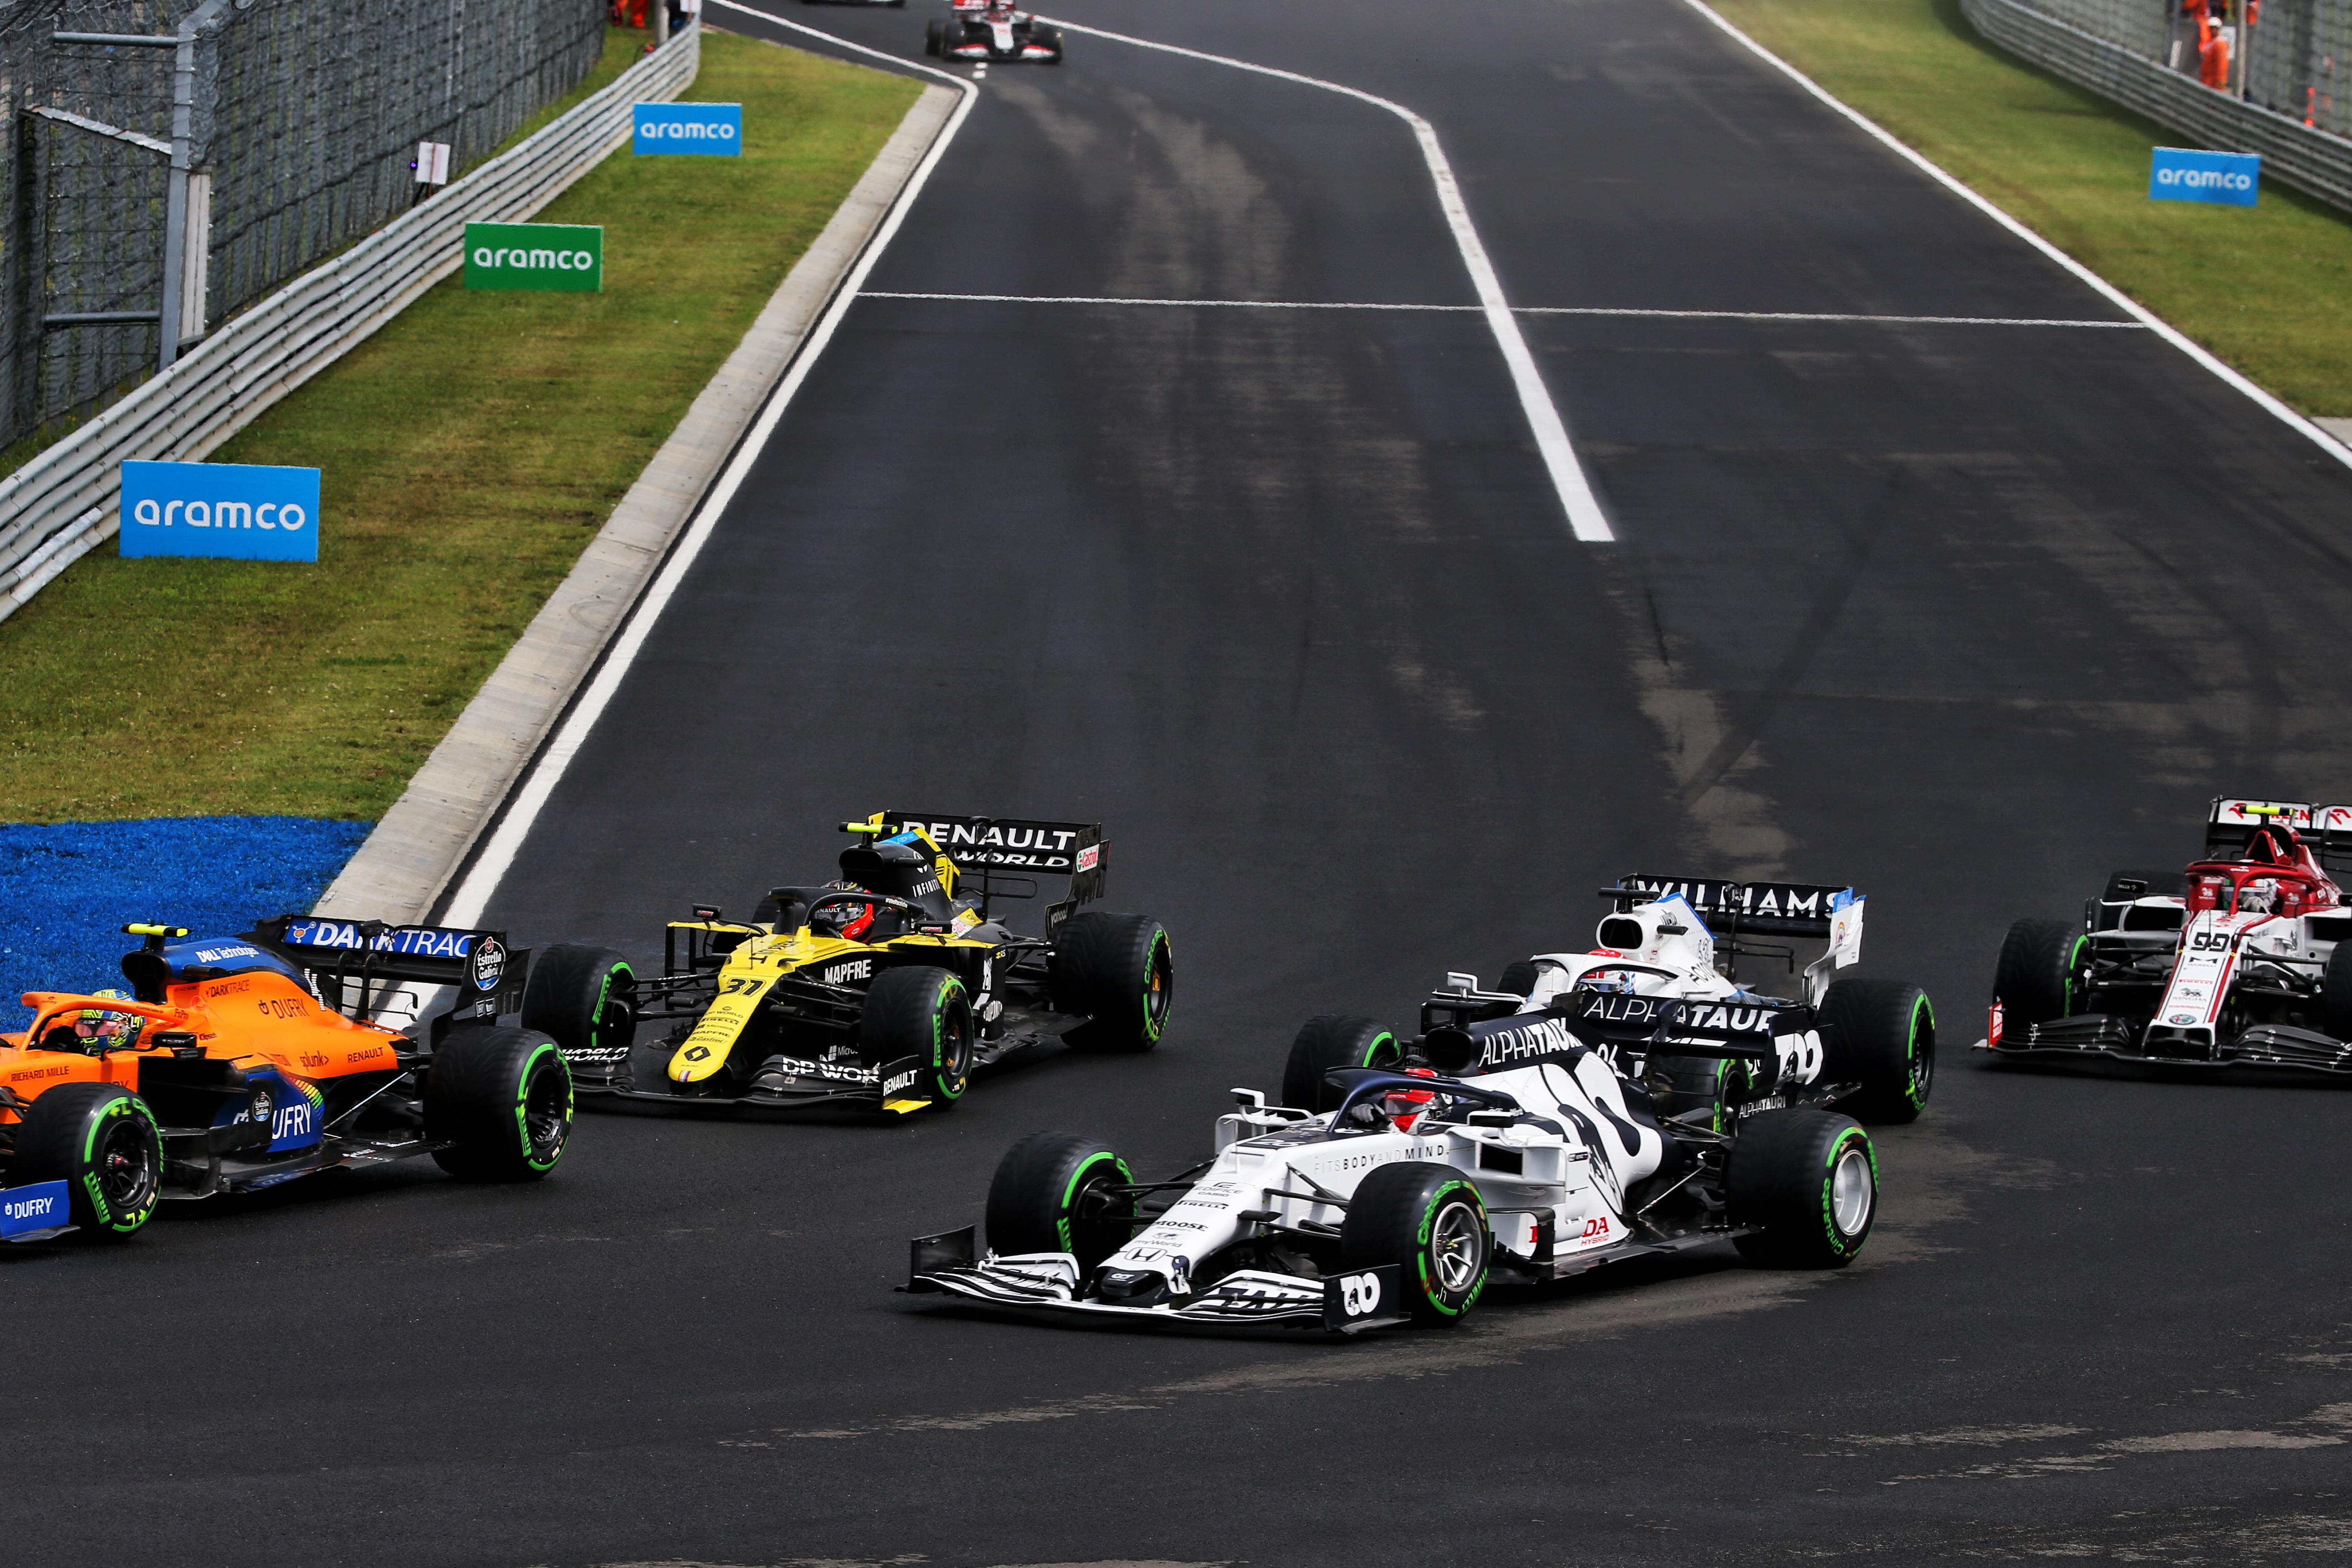 Daniil Kvyat AlphaTauri Hungarian Grand Prix 2020